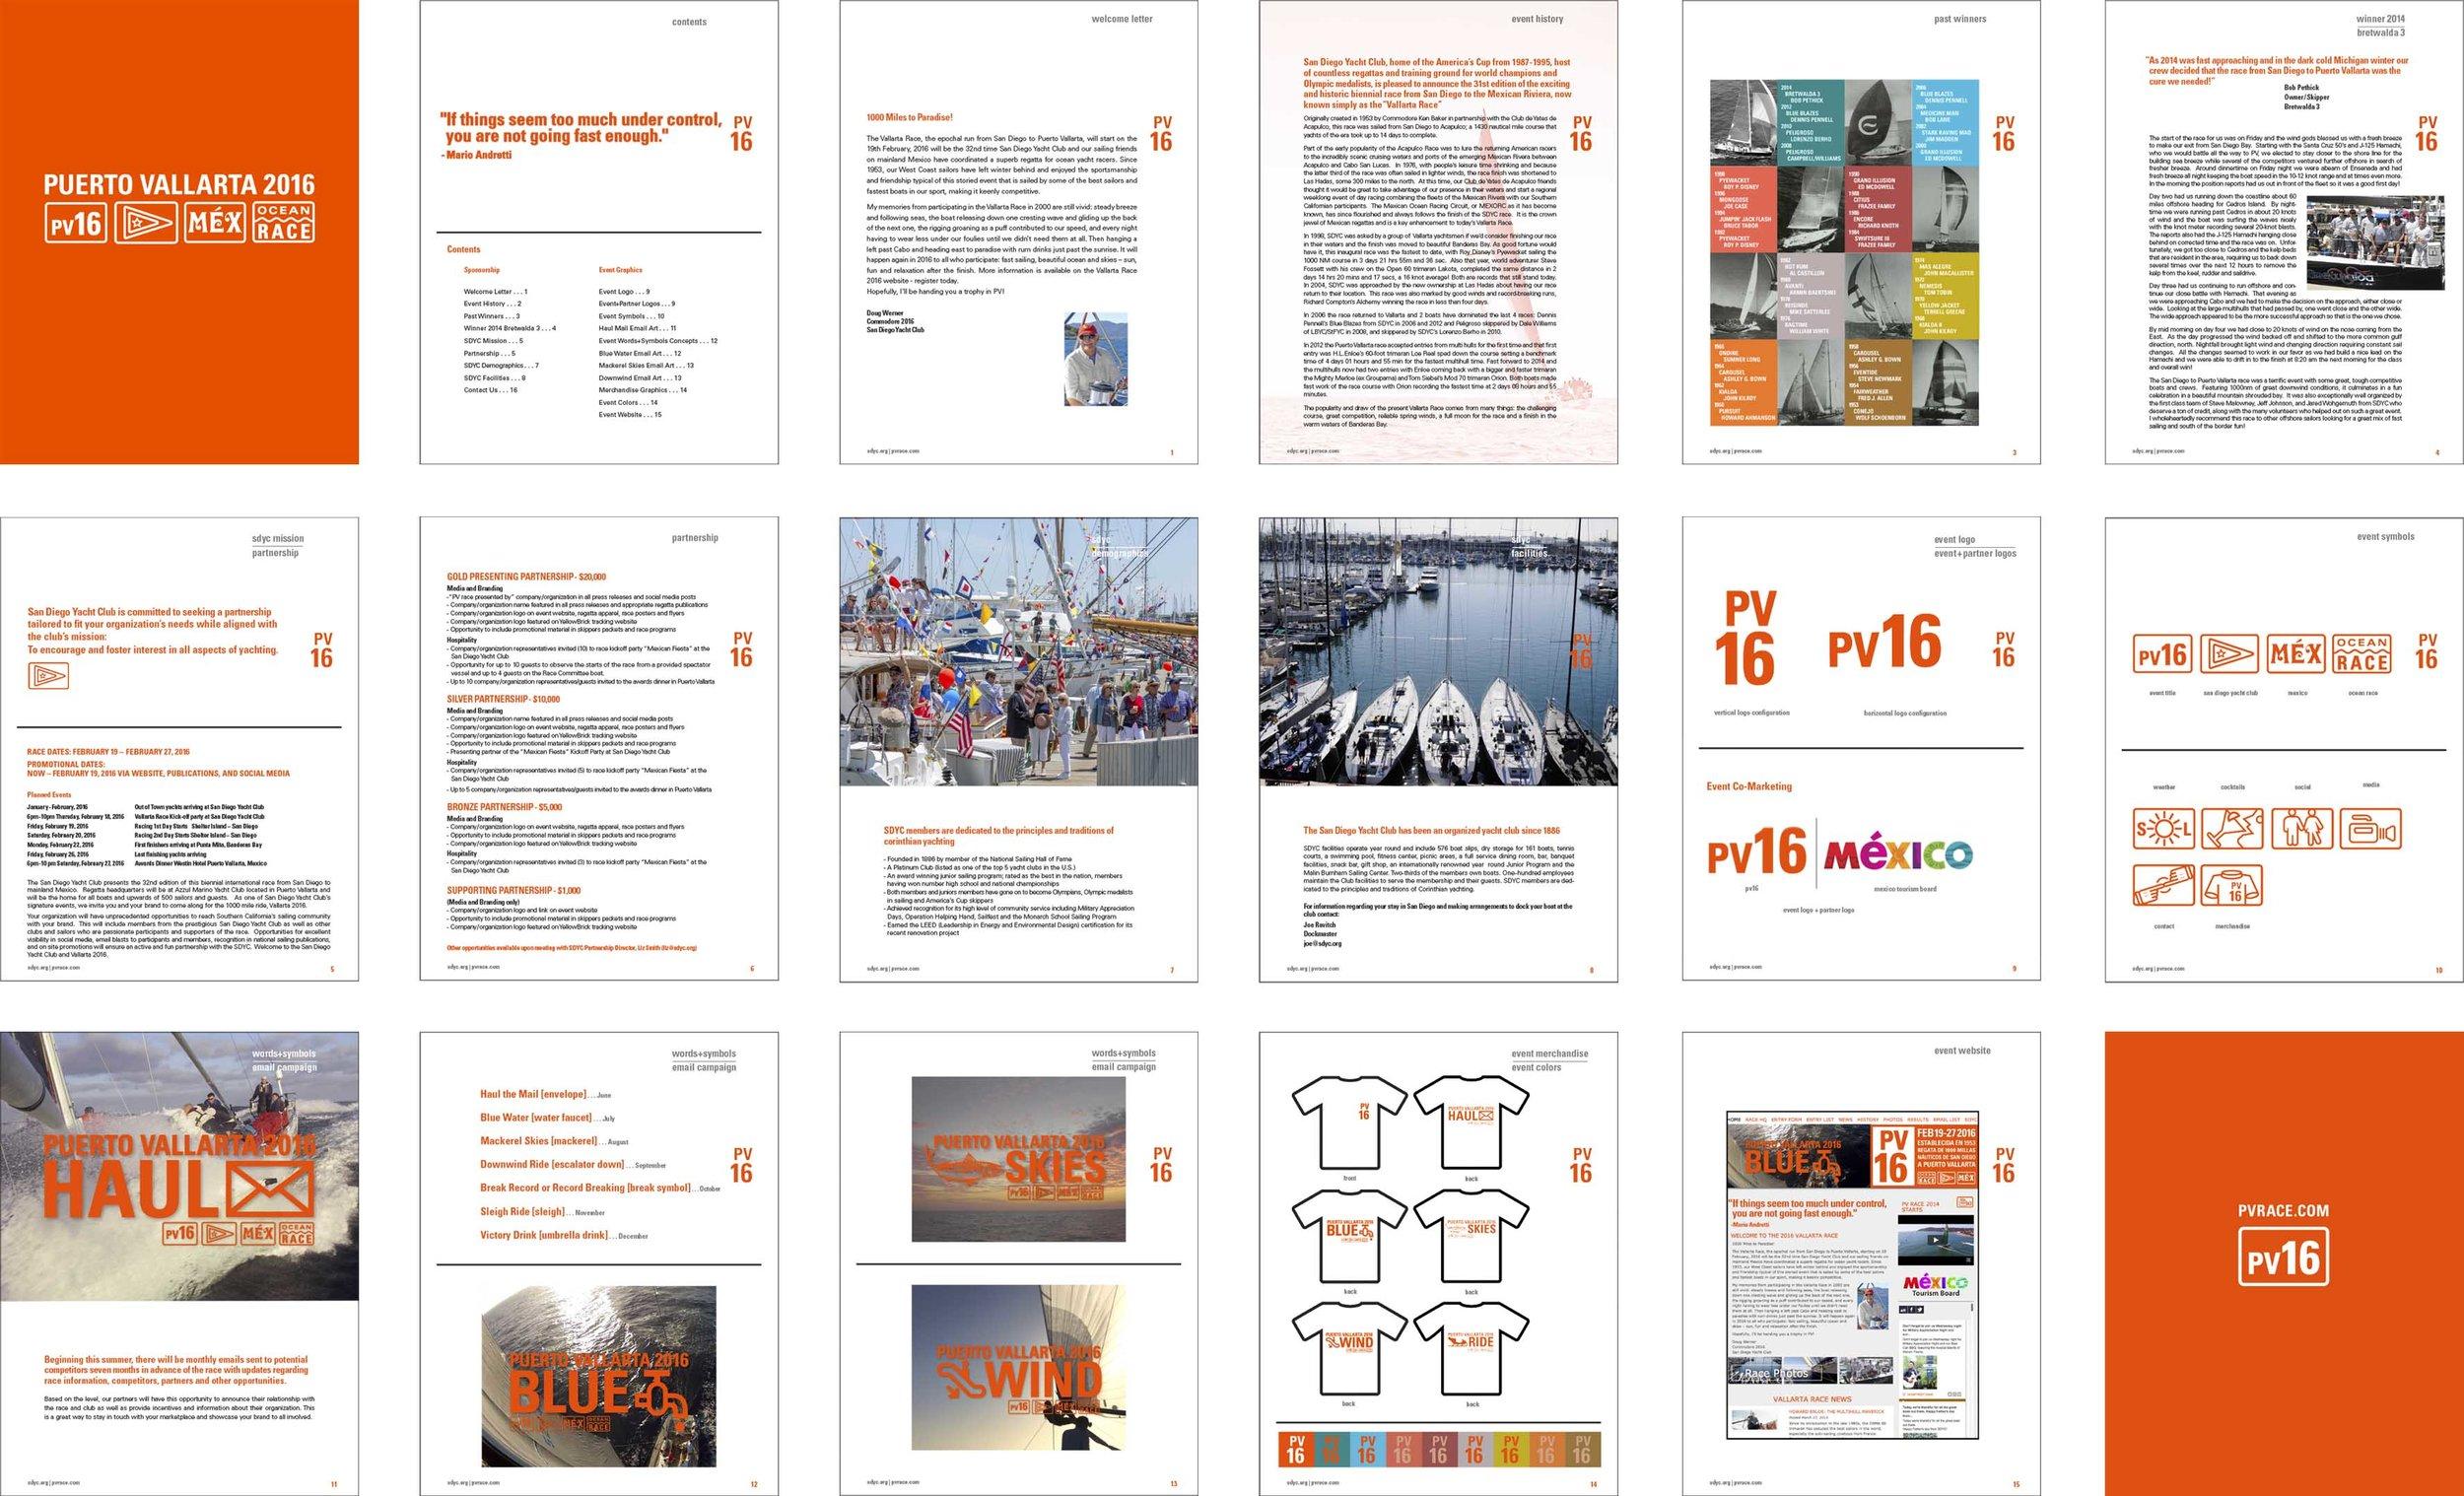 pv2016_portfolio_2016_guide.jpg